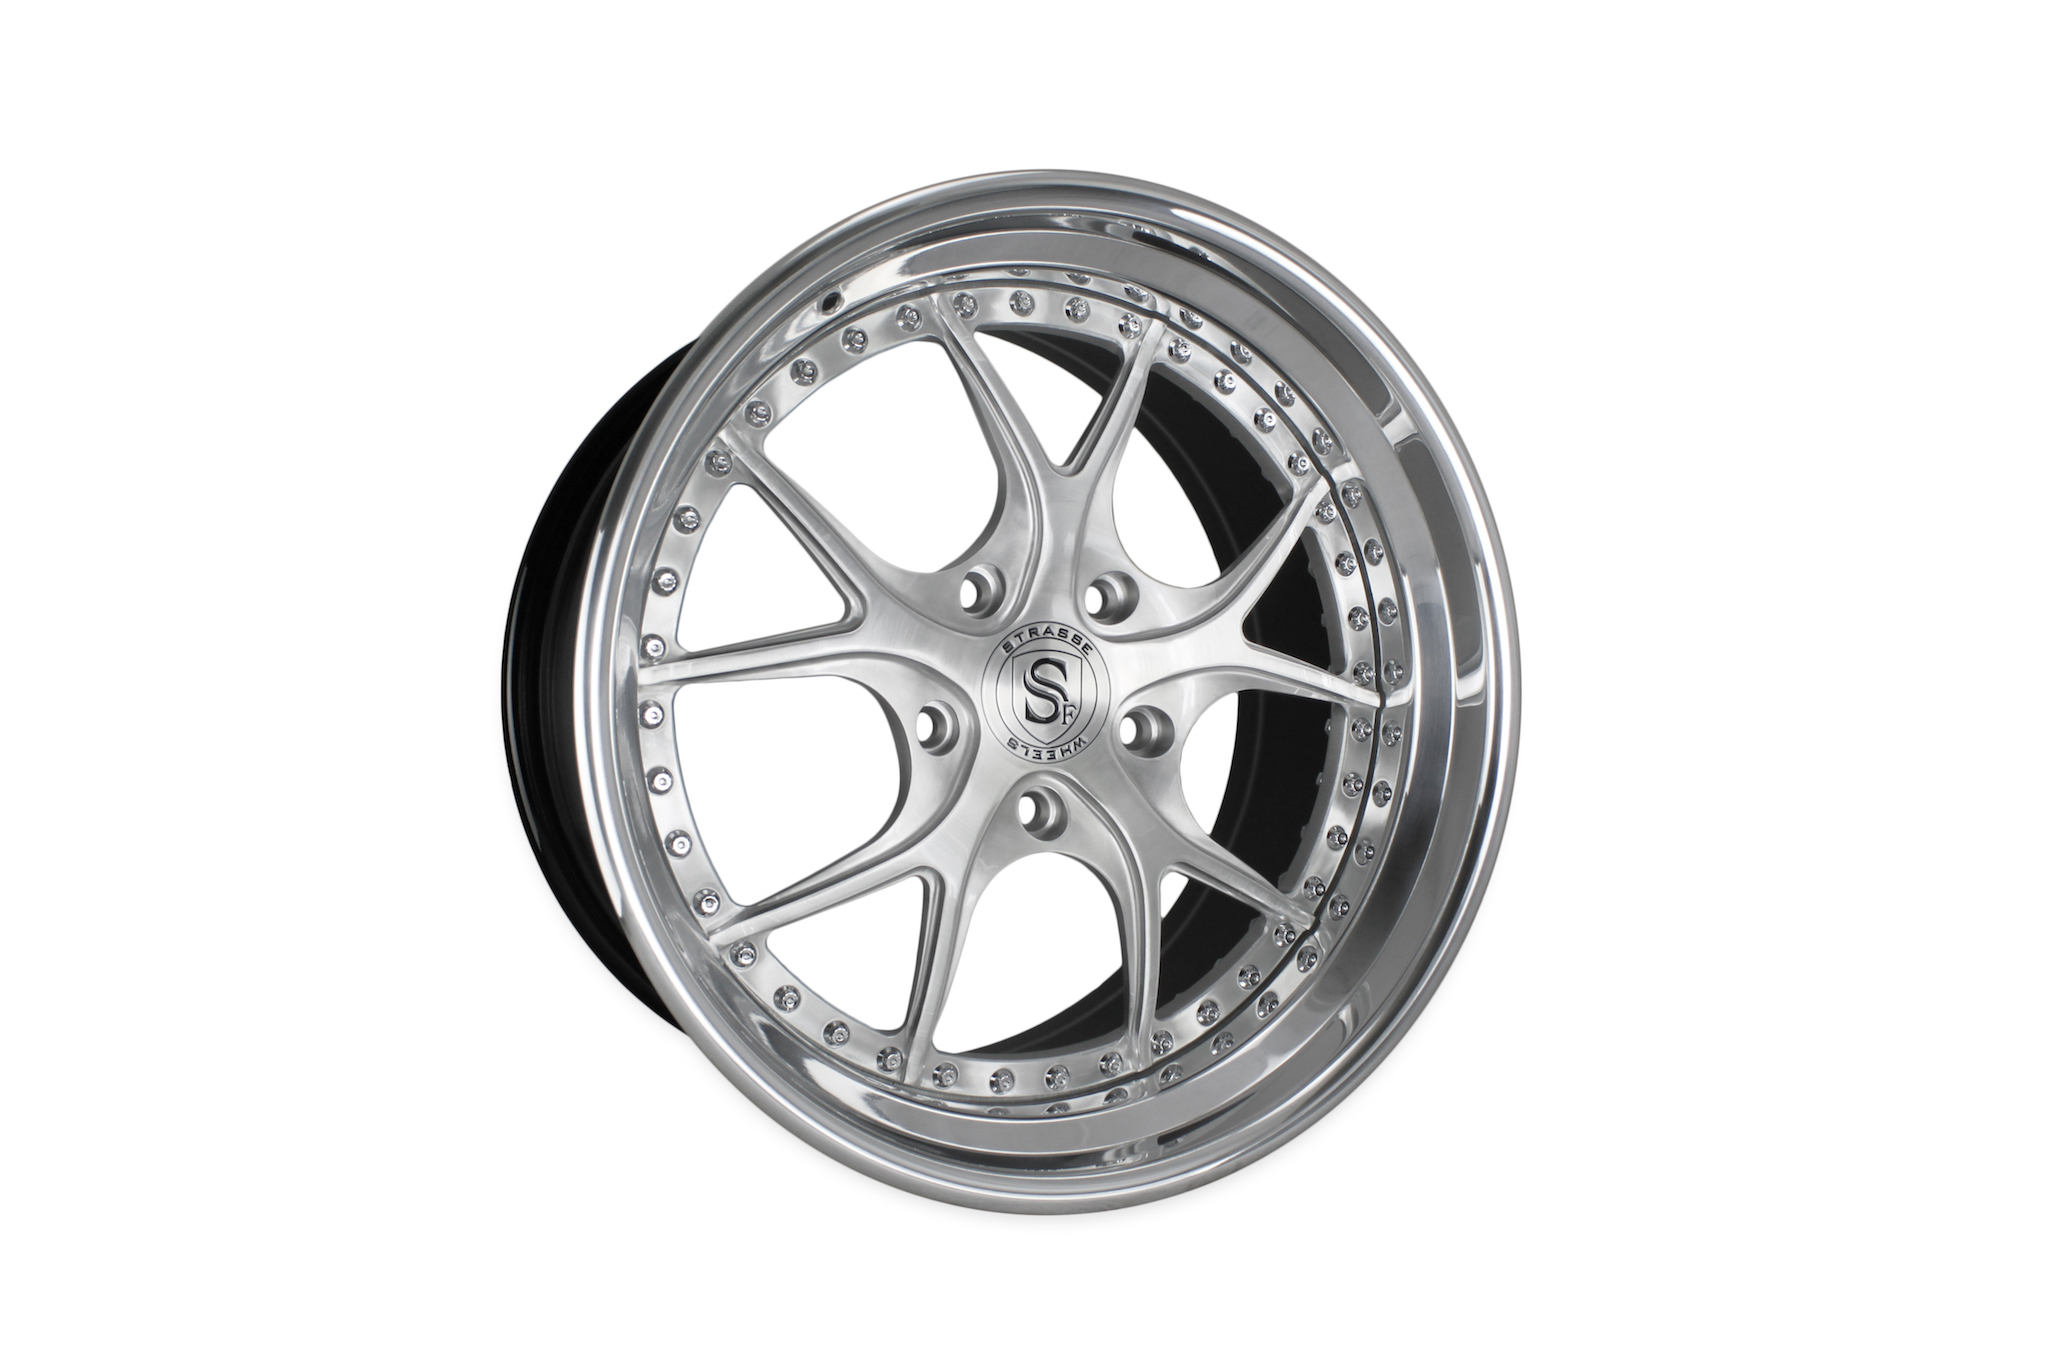 Strasse SM5R PERFORMANCE 3 Piece Forged Wheels